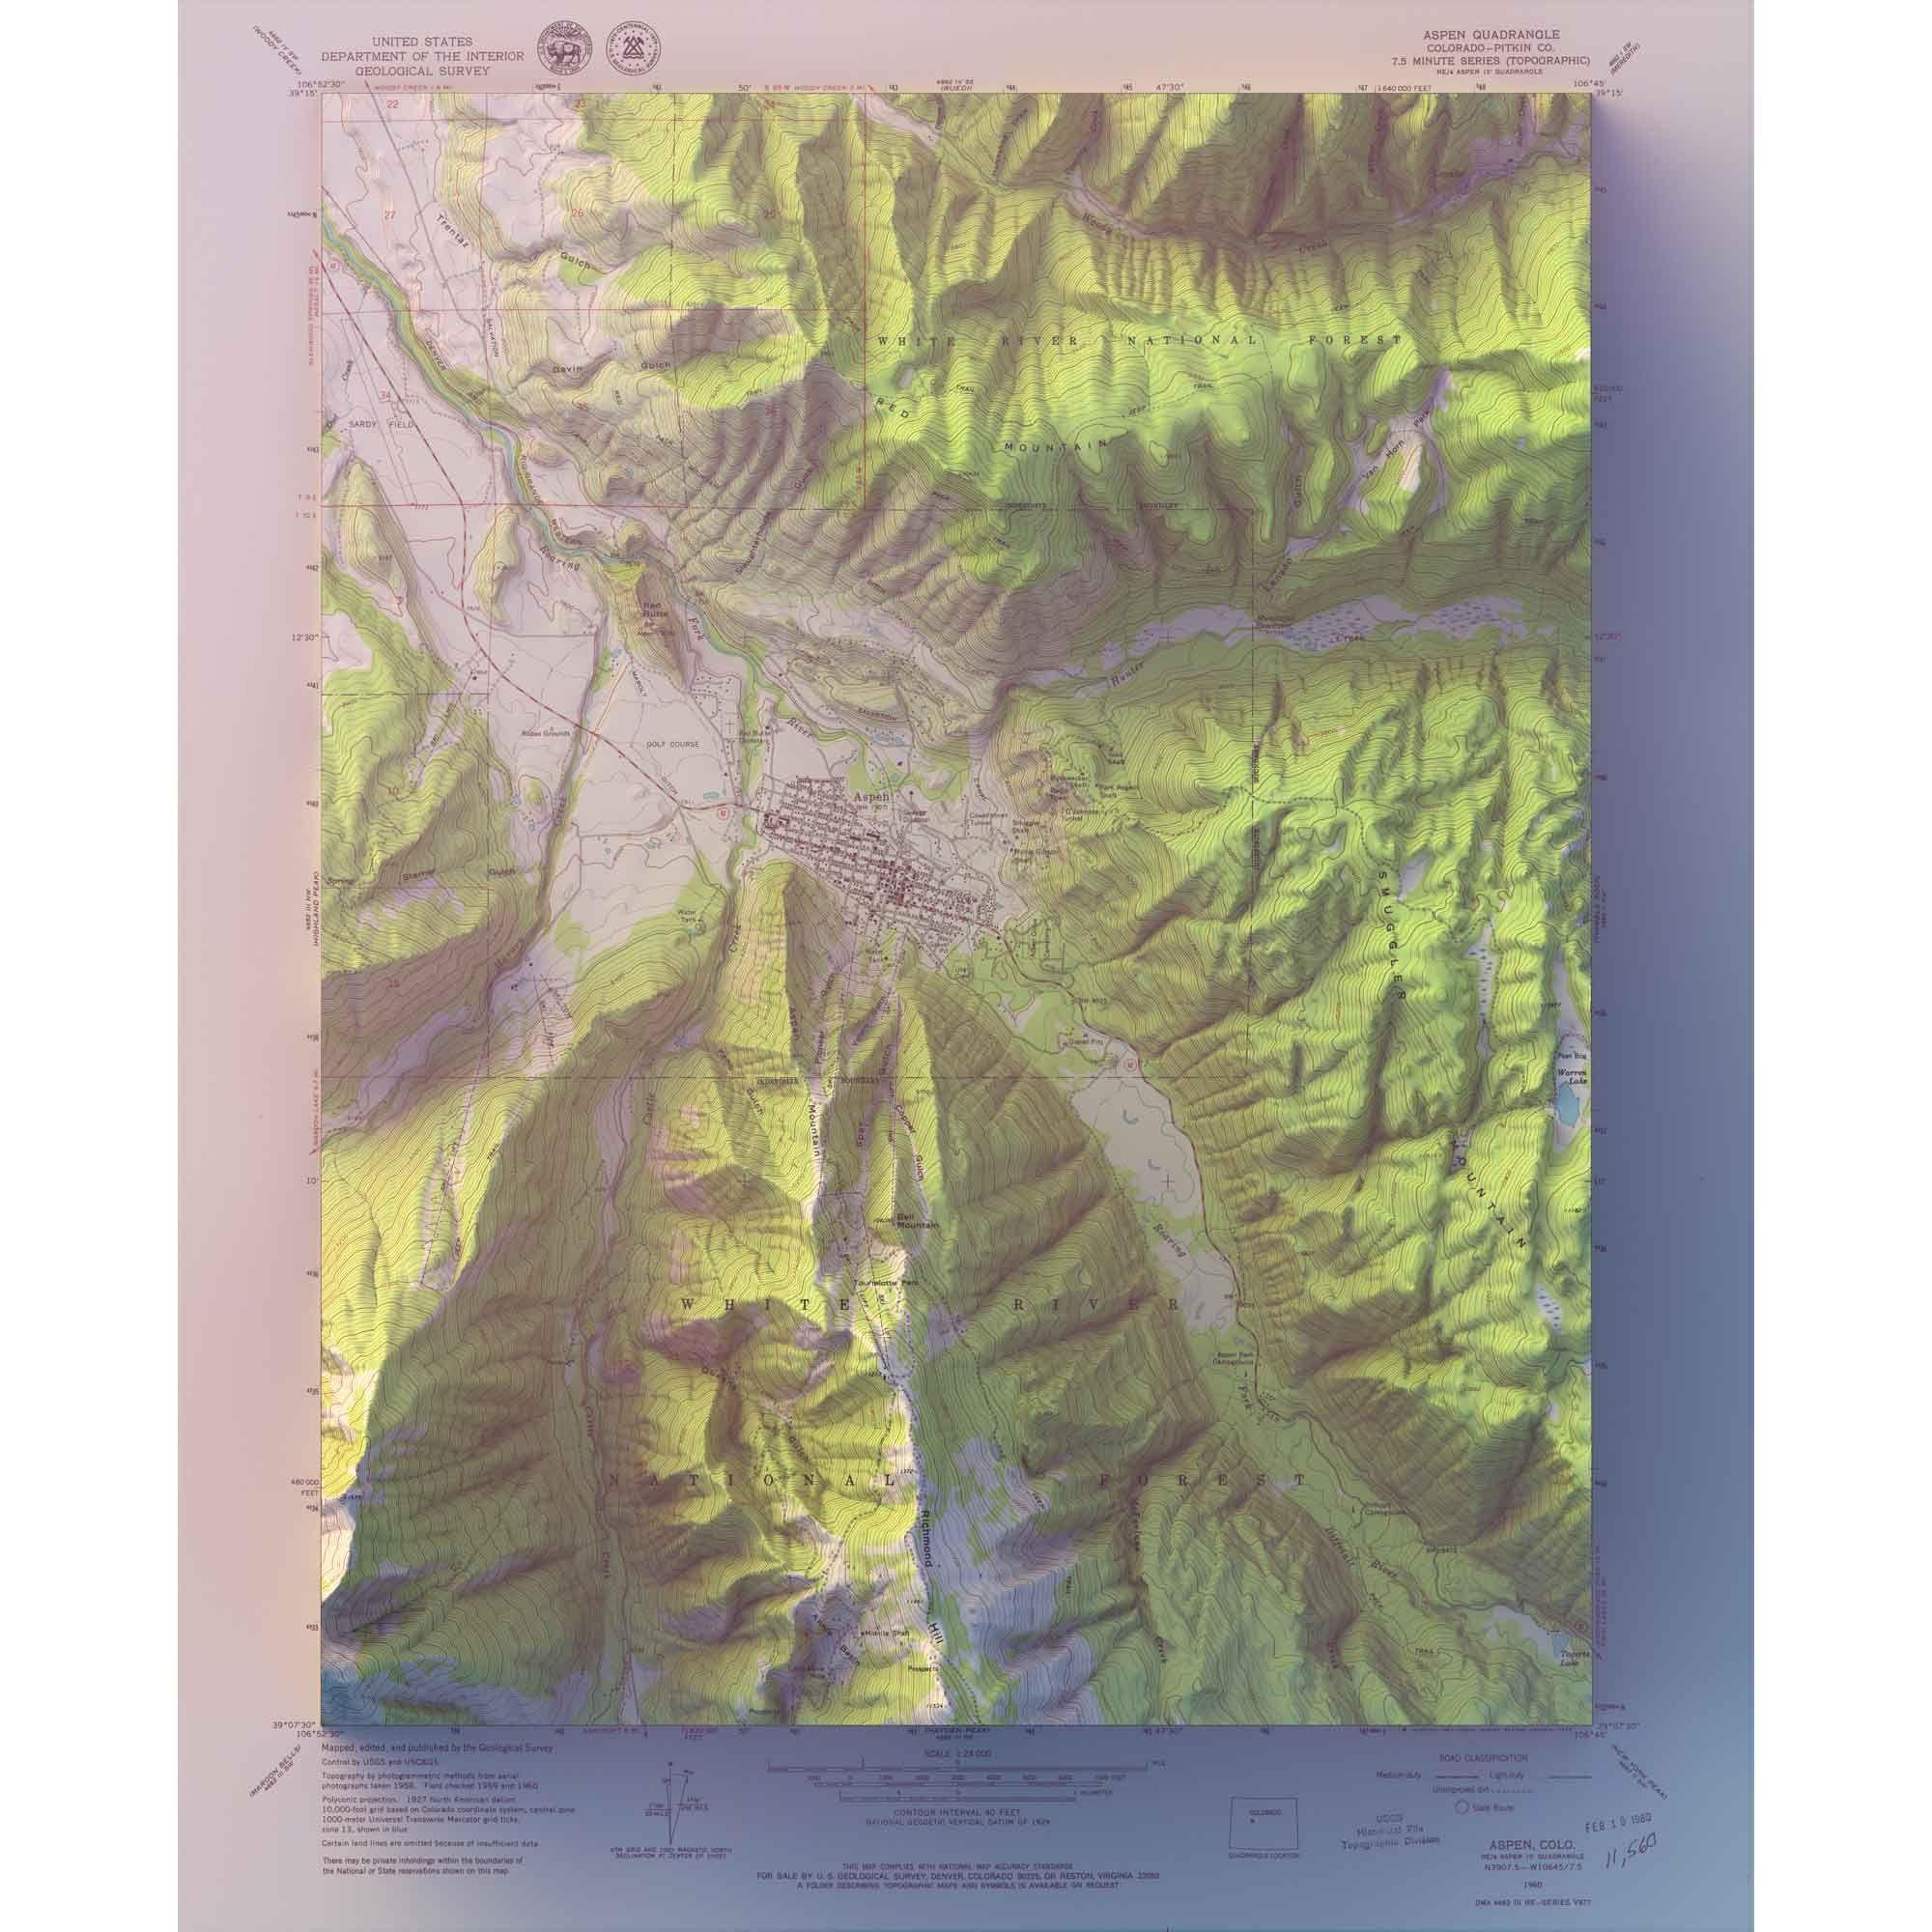 Aspen Colorado Scott Reinhard Maps Topographic Map White Gallery Frames Map